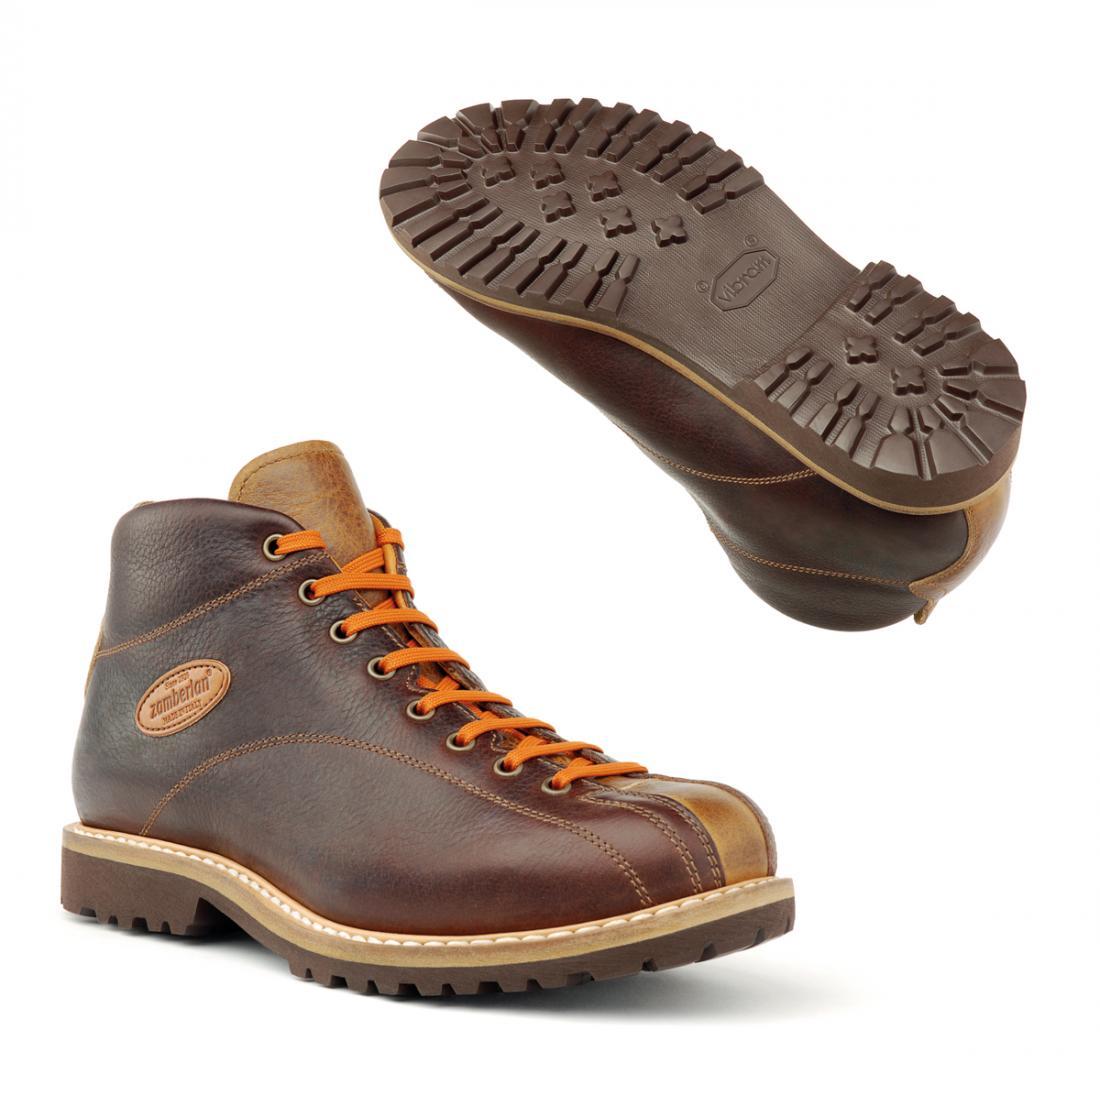 Ботинки 1121 CORTINA MID GW от Zamberlan